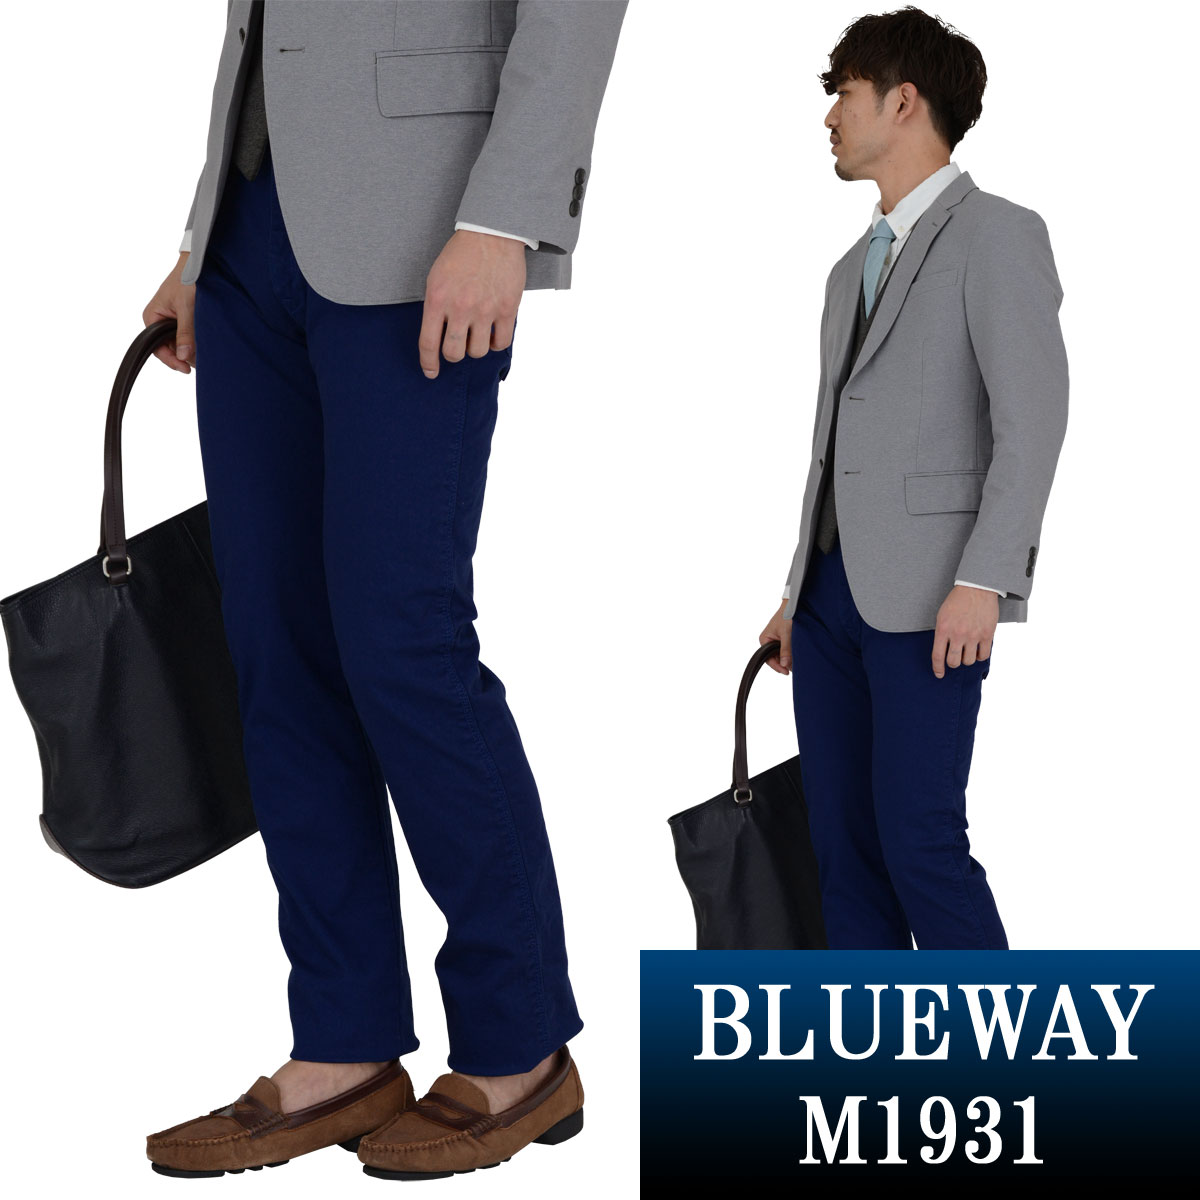 BLUEWAY:コーマストレッチサテン・タイトストレート パンツ(ネイビー):M1931-35 ブルーウェイ メンズ チノパン 裾上げ